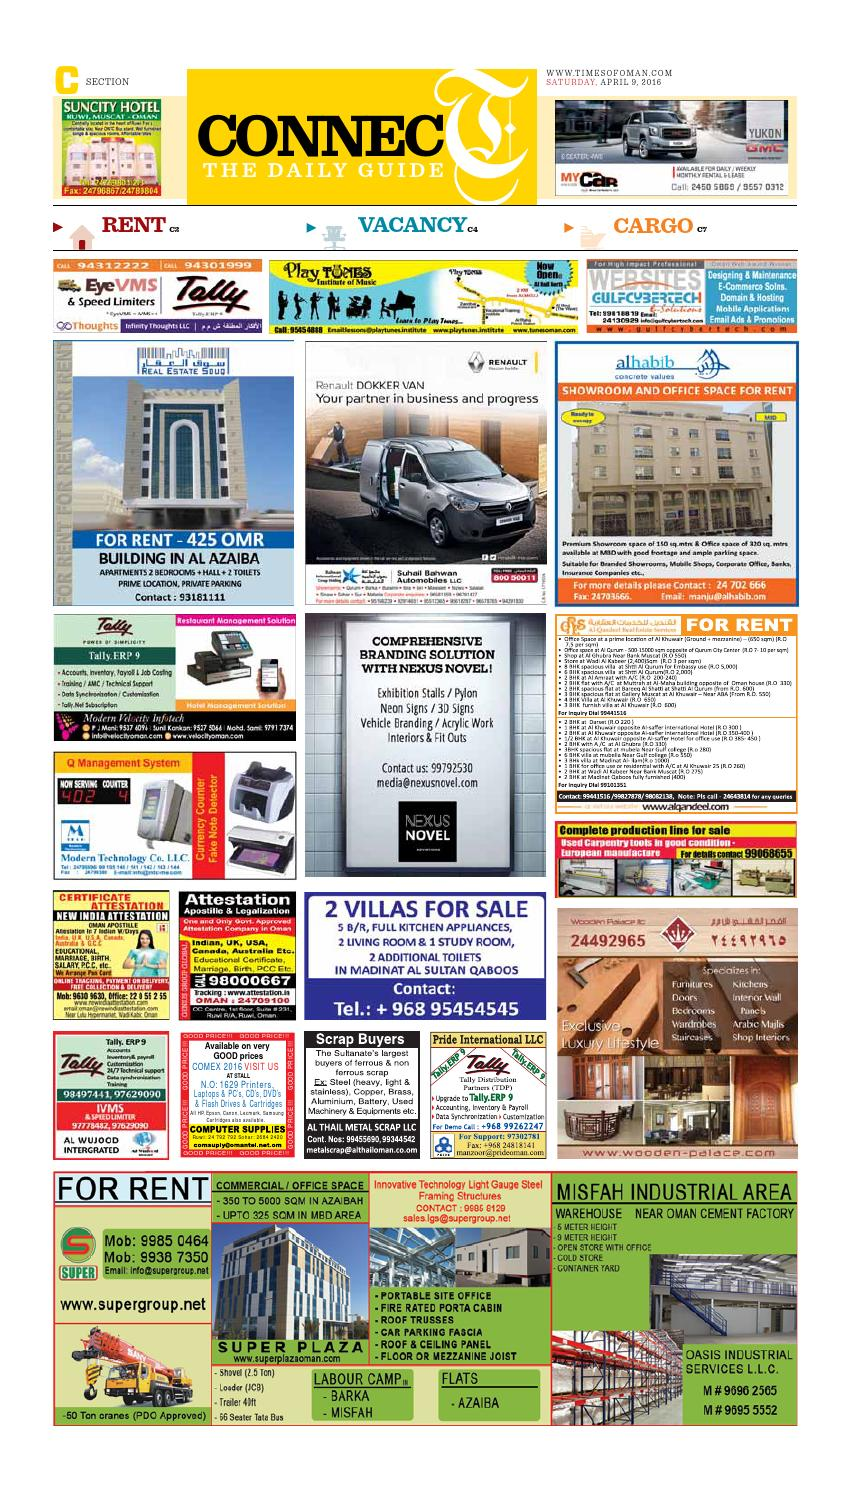 Times of Oman - April 9, 2016